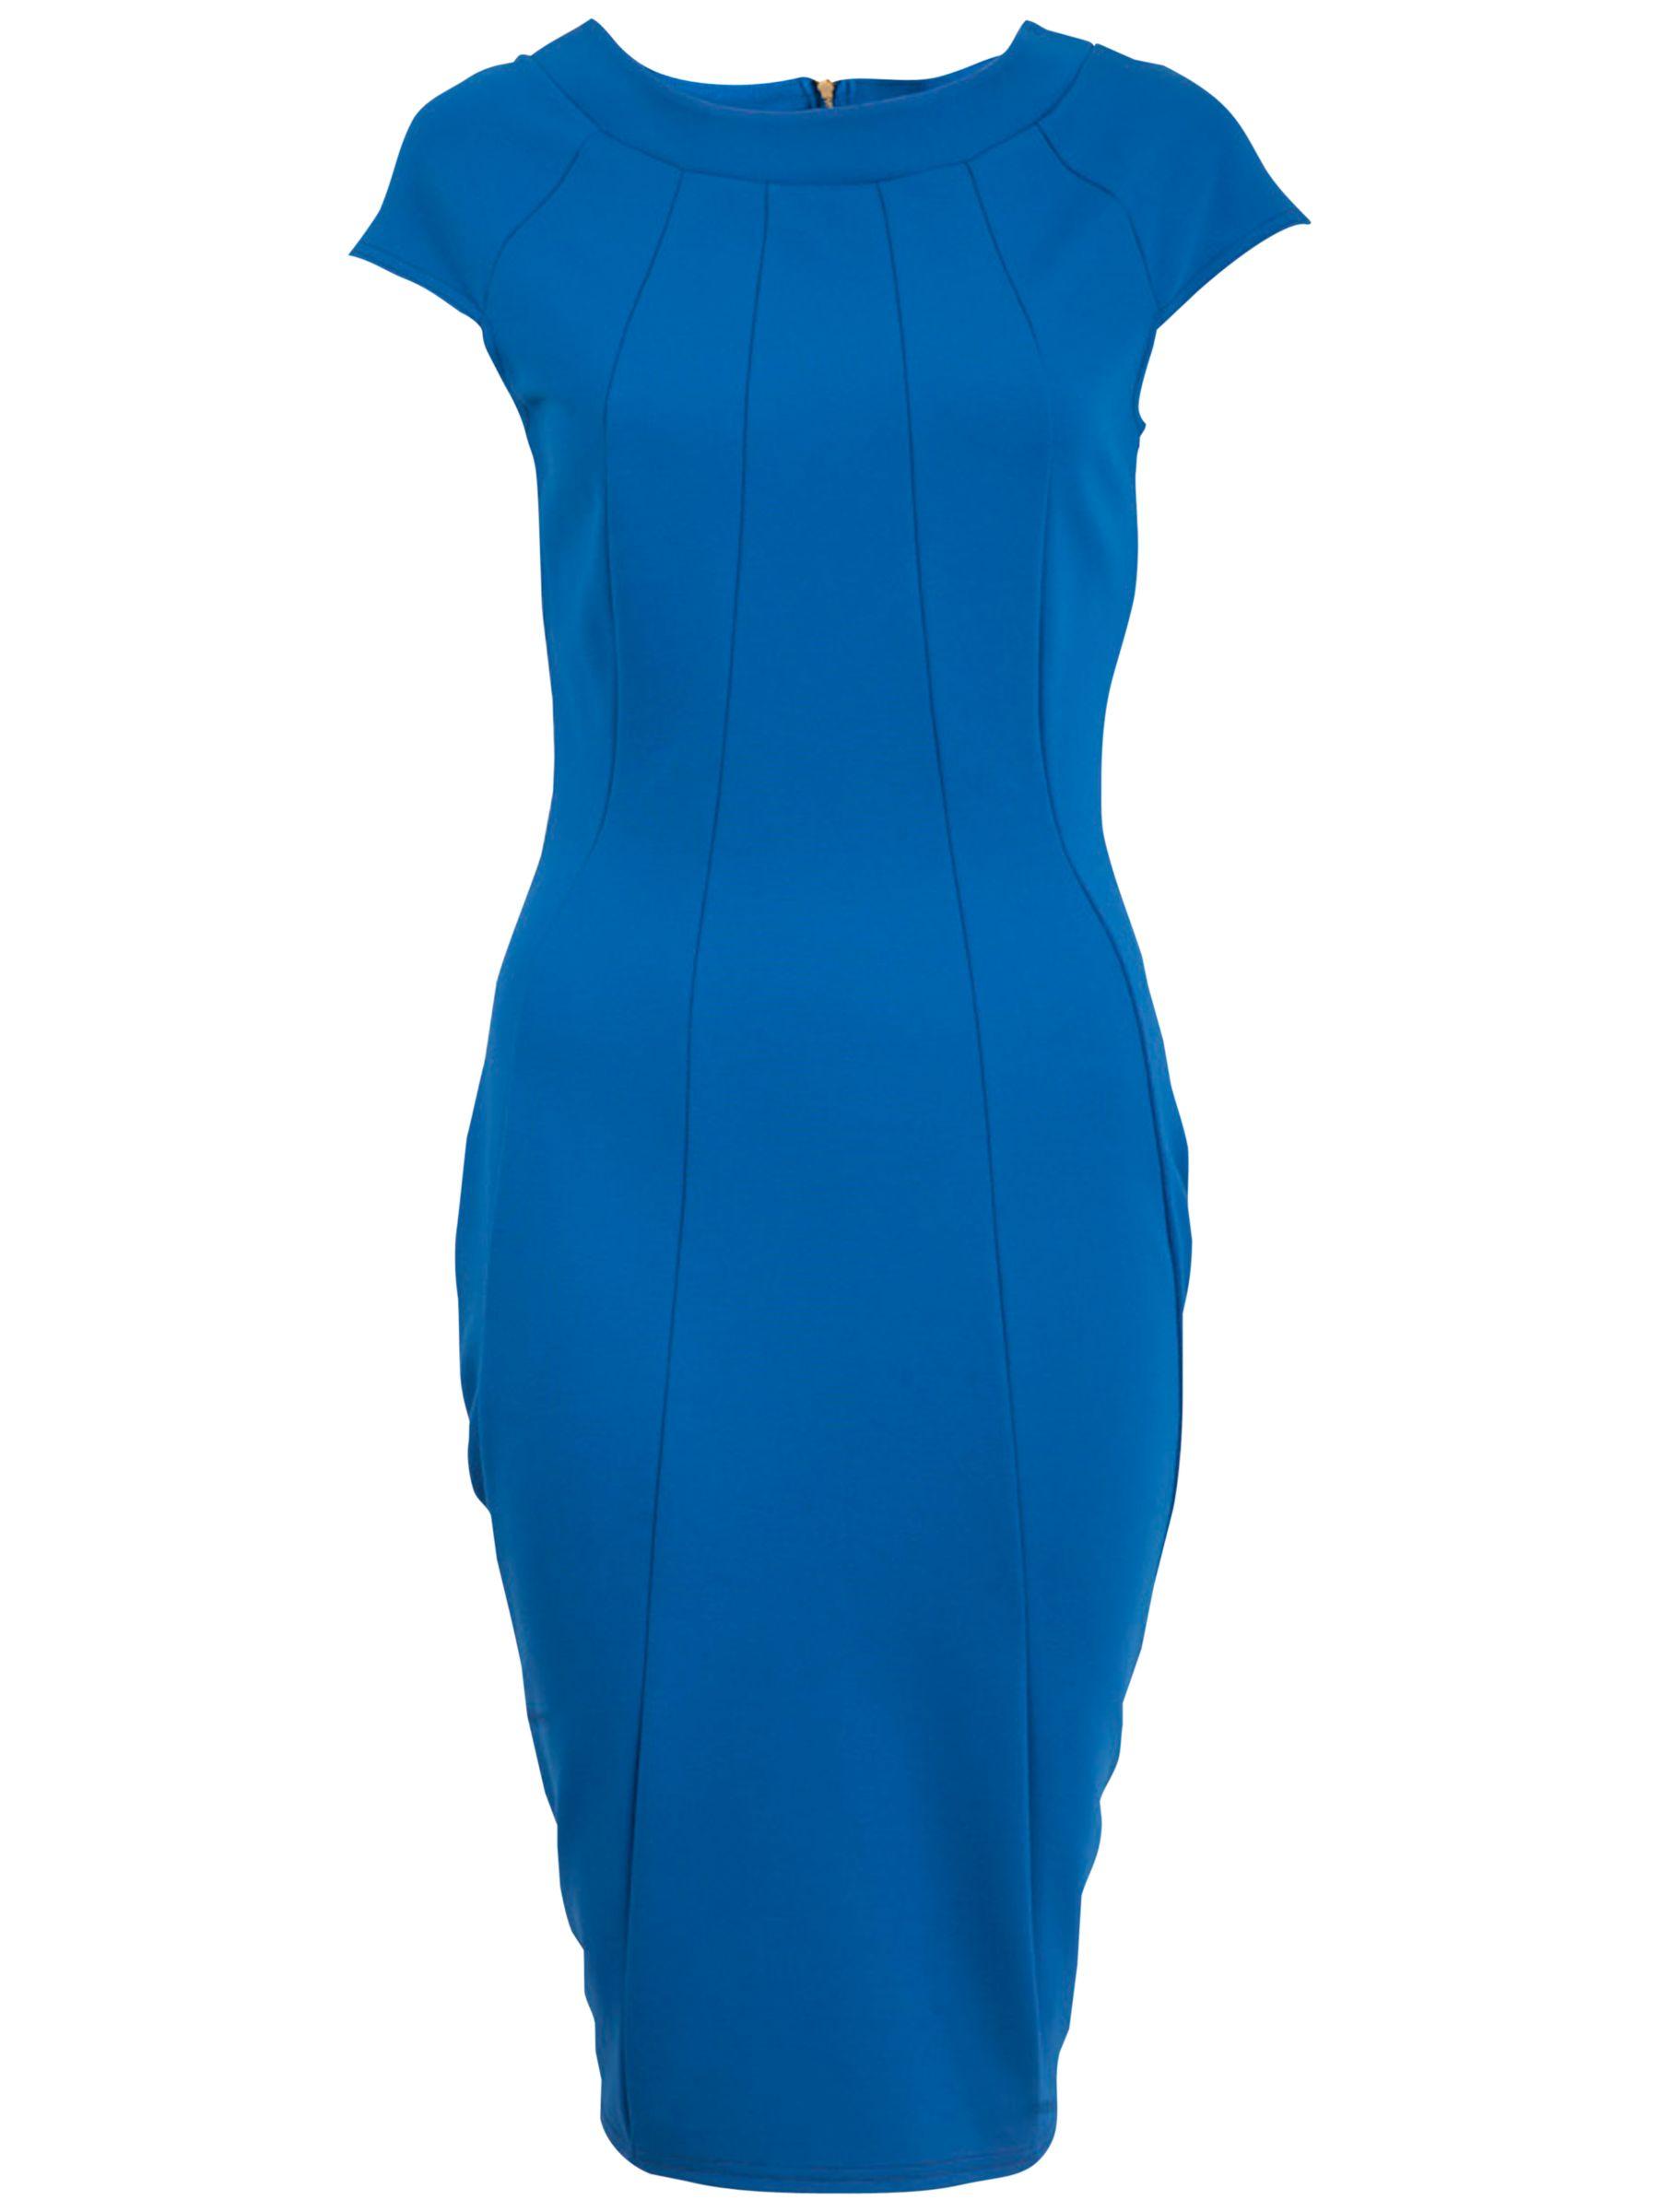 almari panelled ponte dress blue, almari, panelled, ponte, dress, blue, 10 12 14 8, women, womens dresses, special offers, womenswear offers, womens dresses offers, 1423299